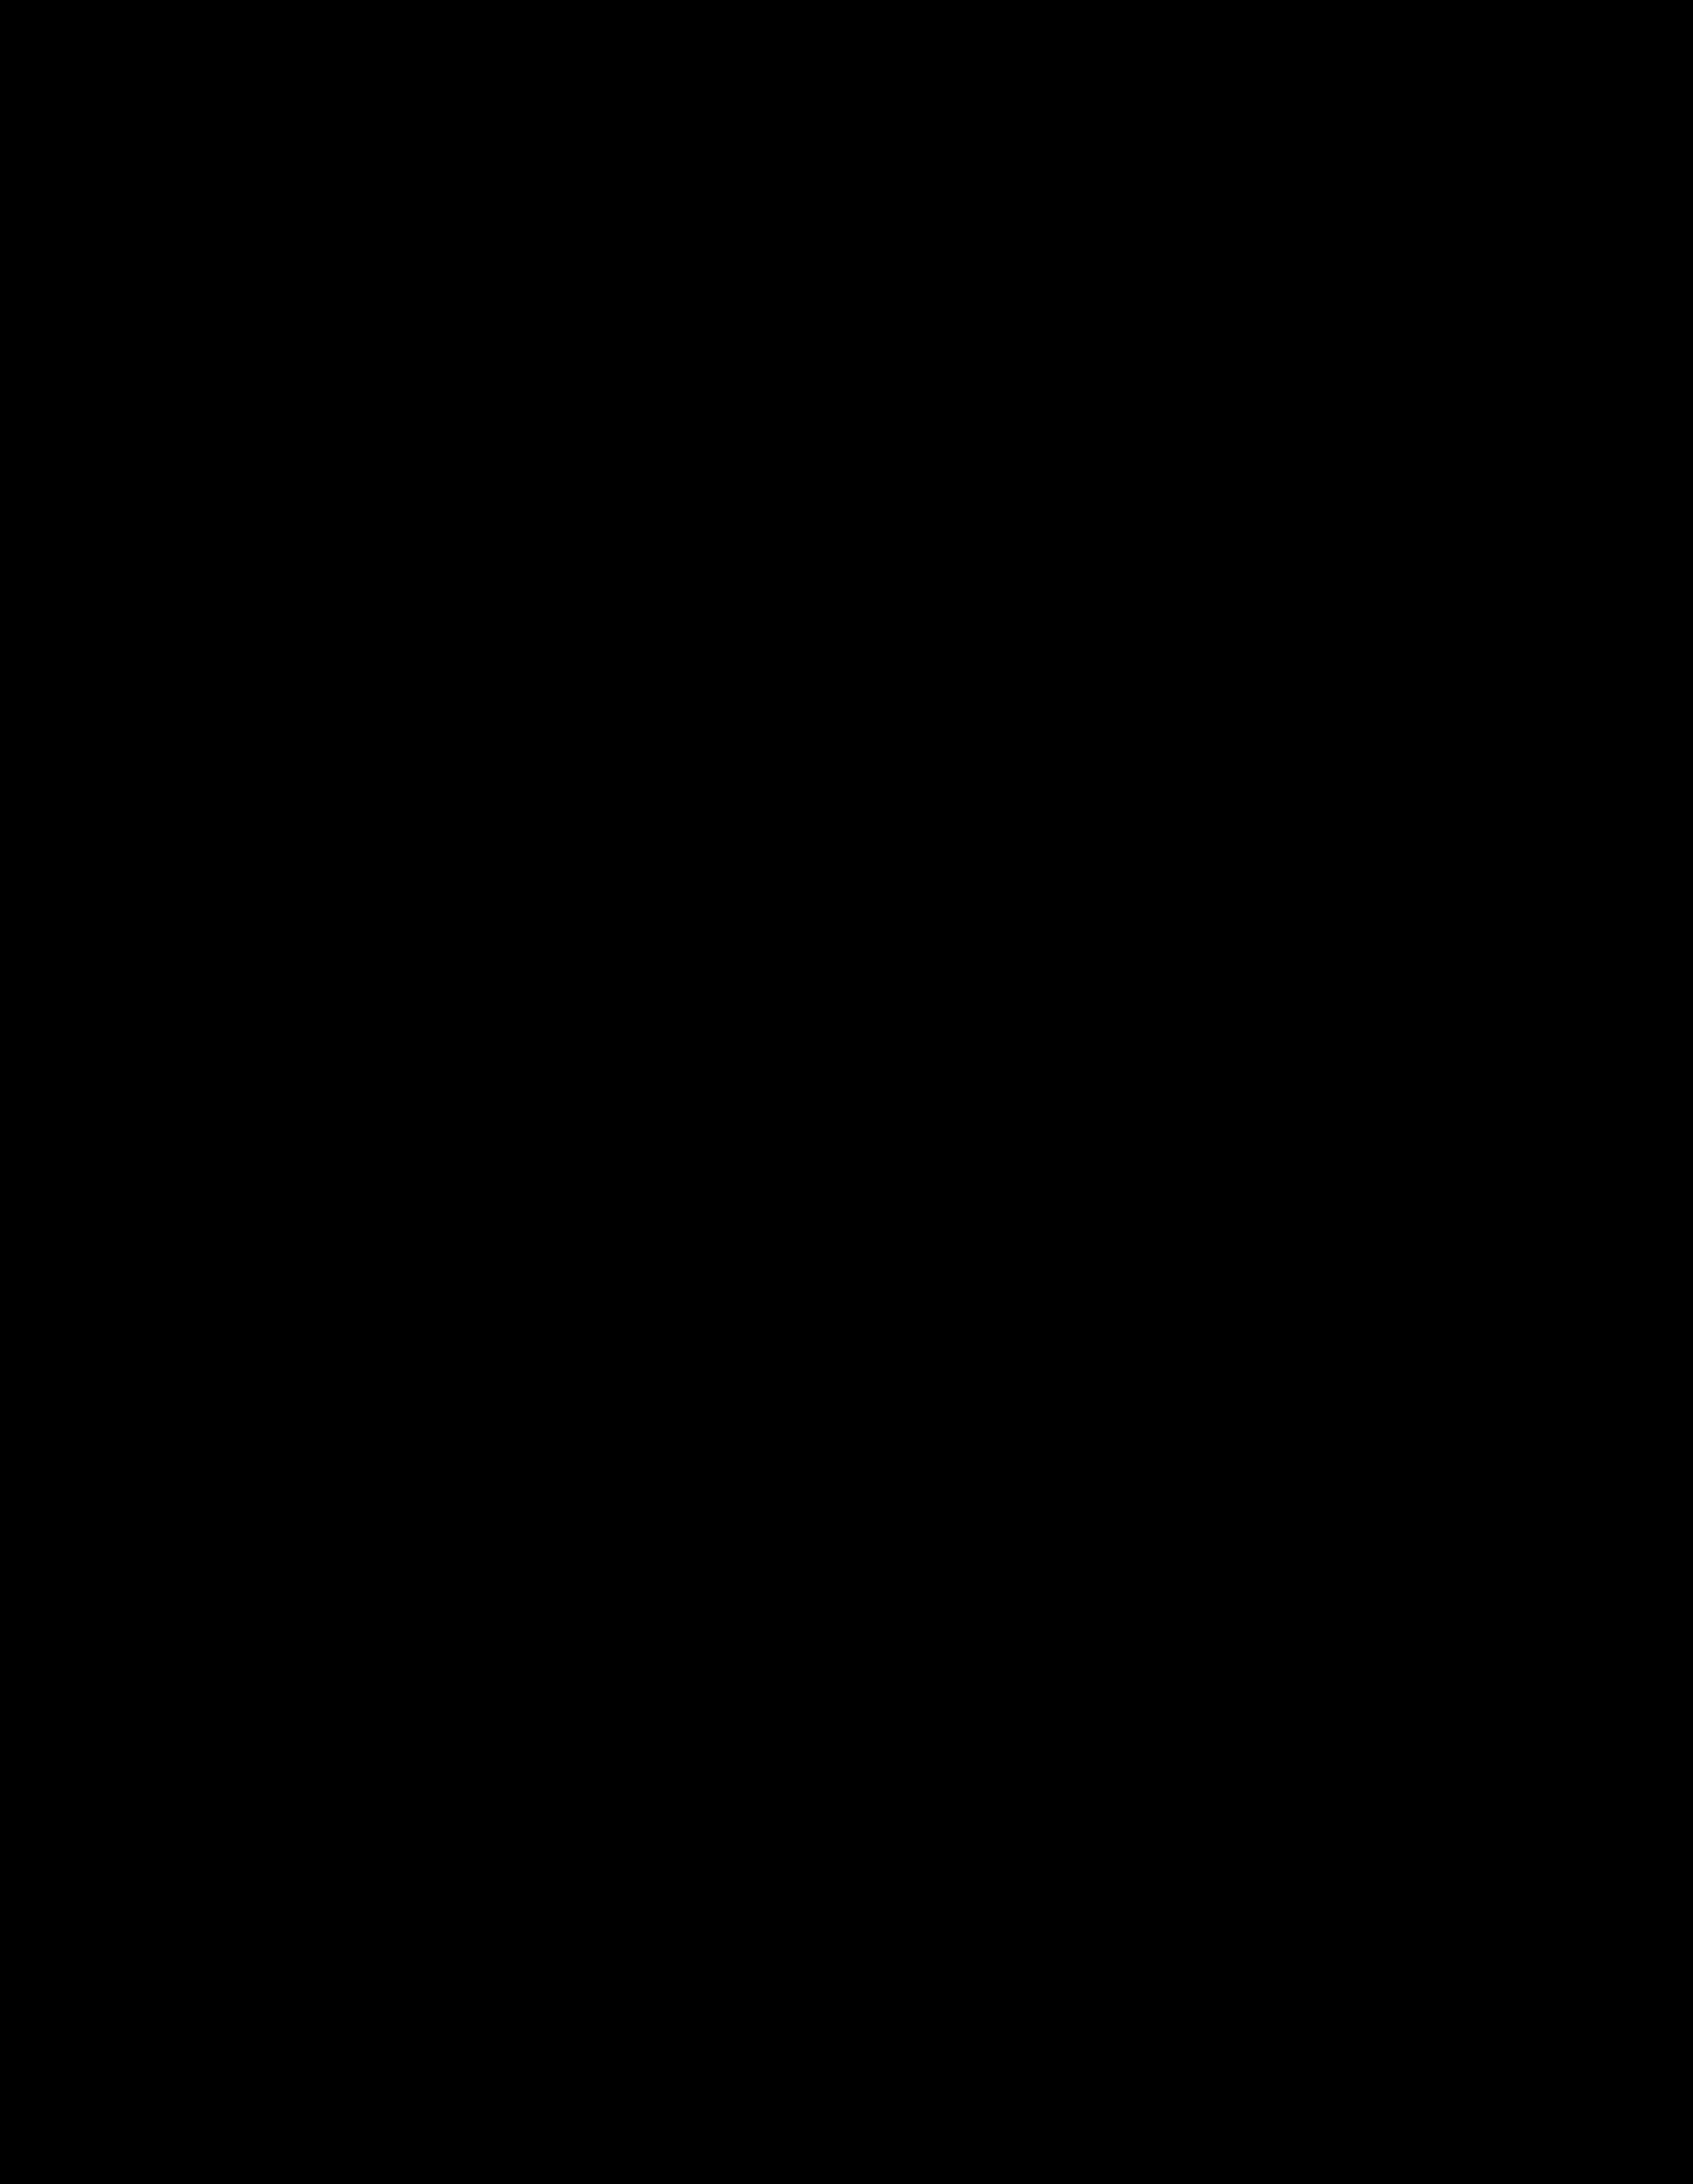 Couple silhouette big image. Clipart beach person